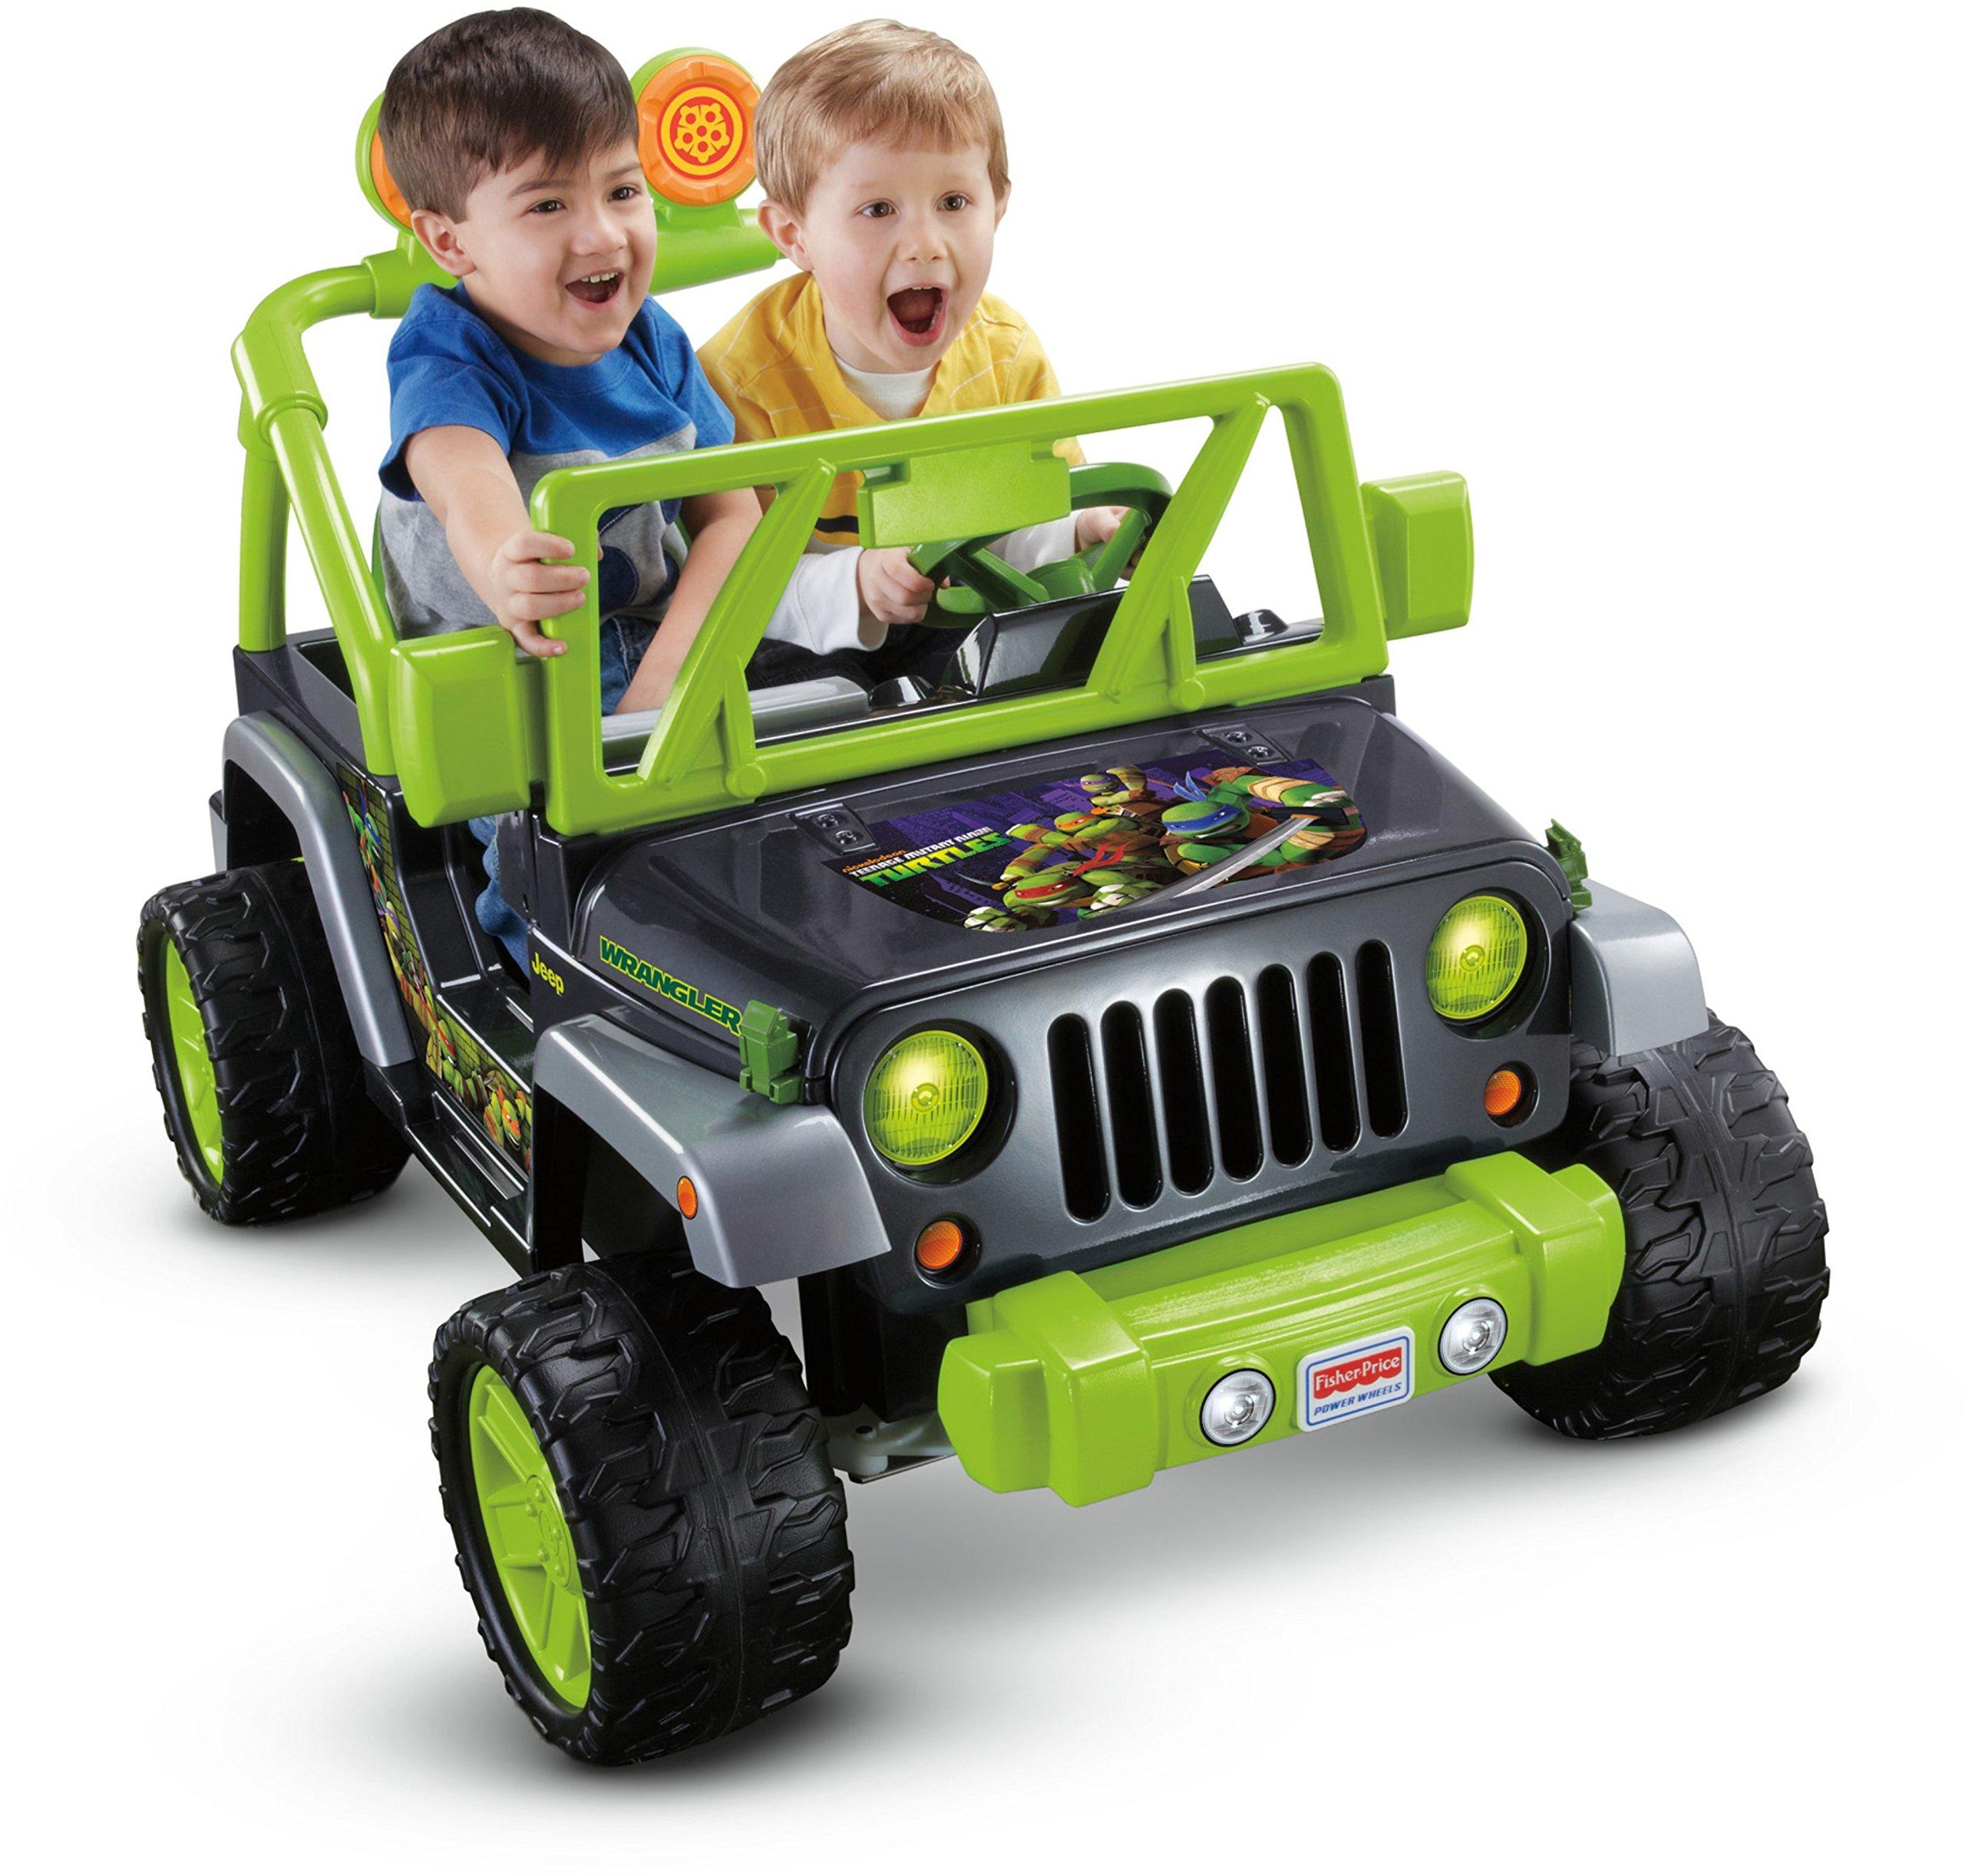 Fisher Price Power Wheels Teenage Mutant Ninja Turtle Jeep Wrangler by Power Wheels